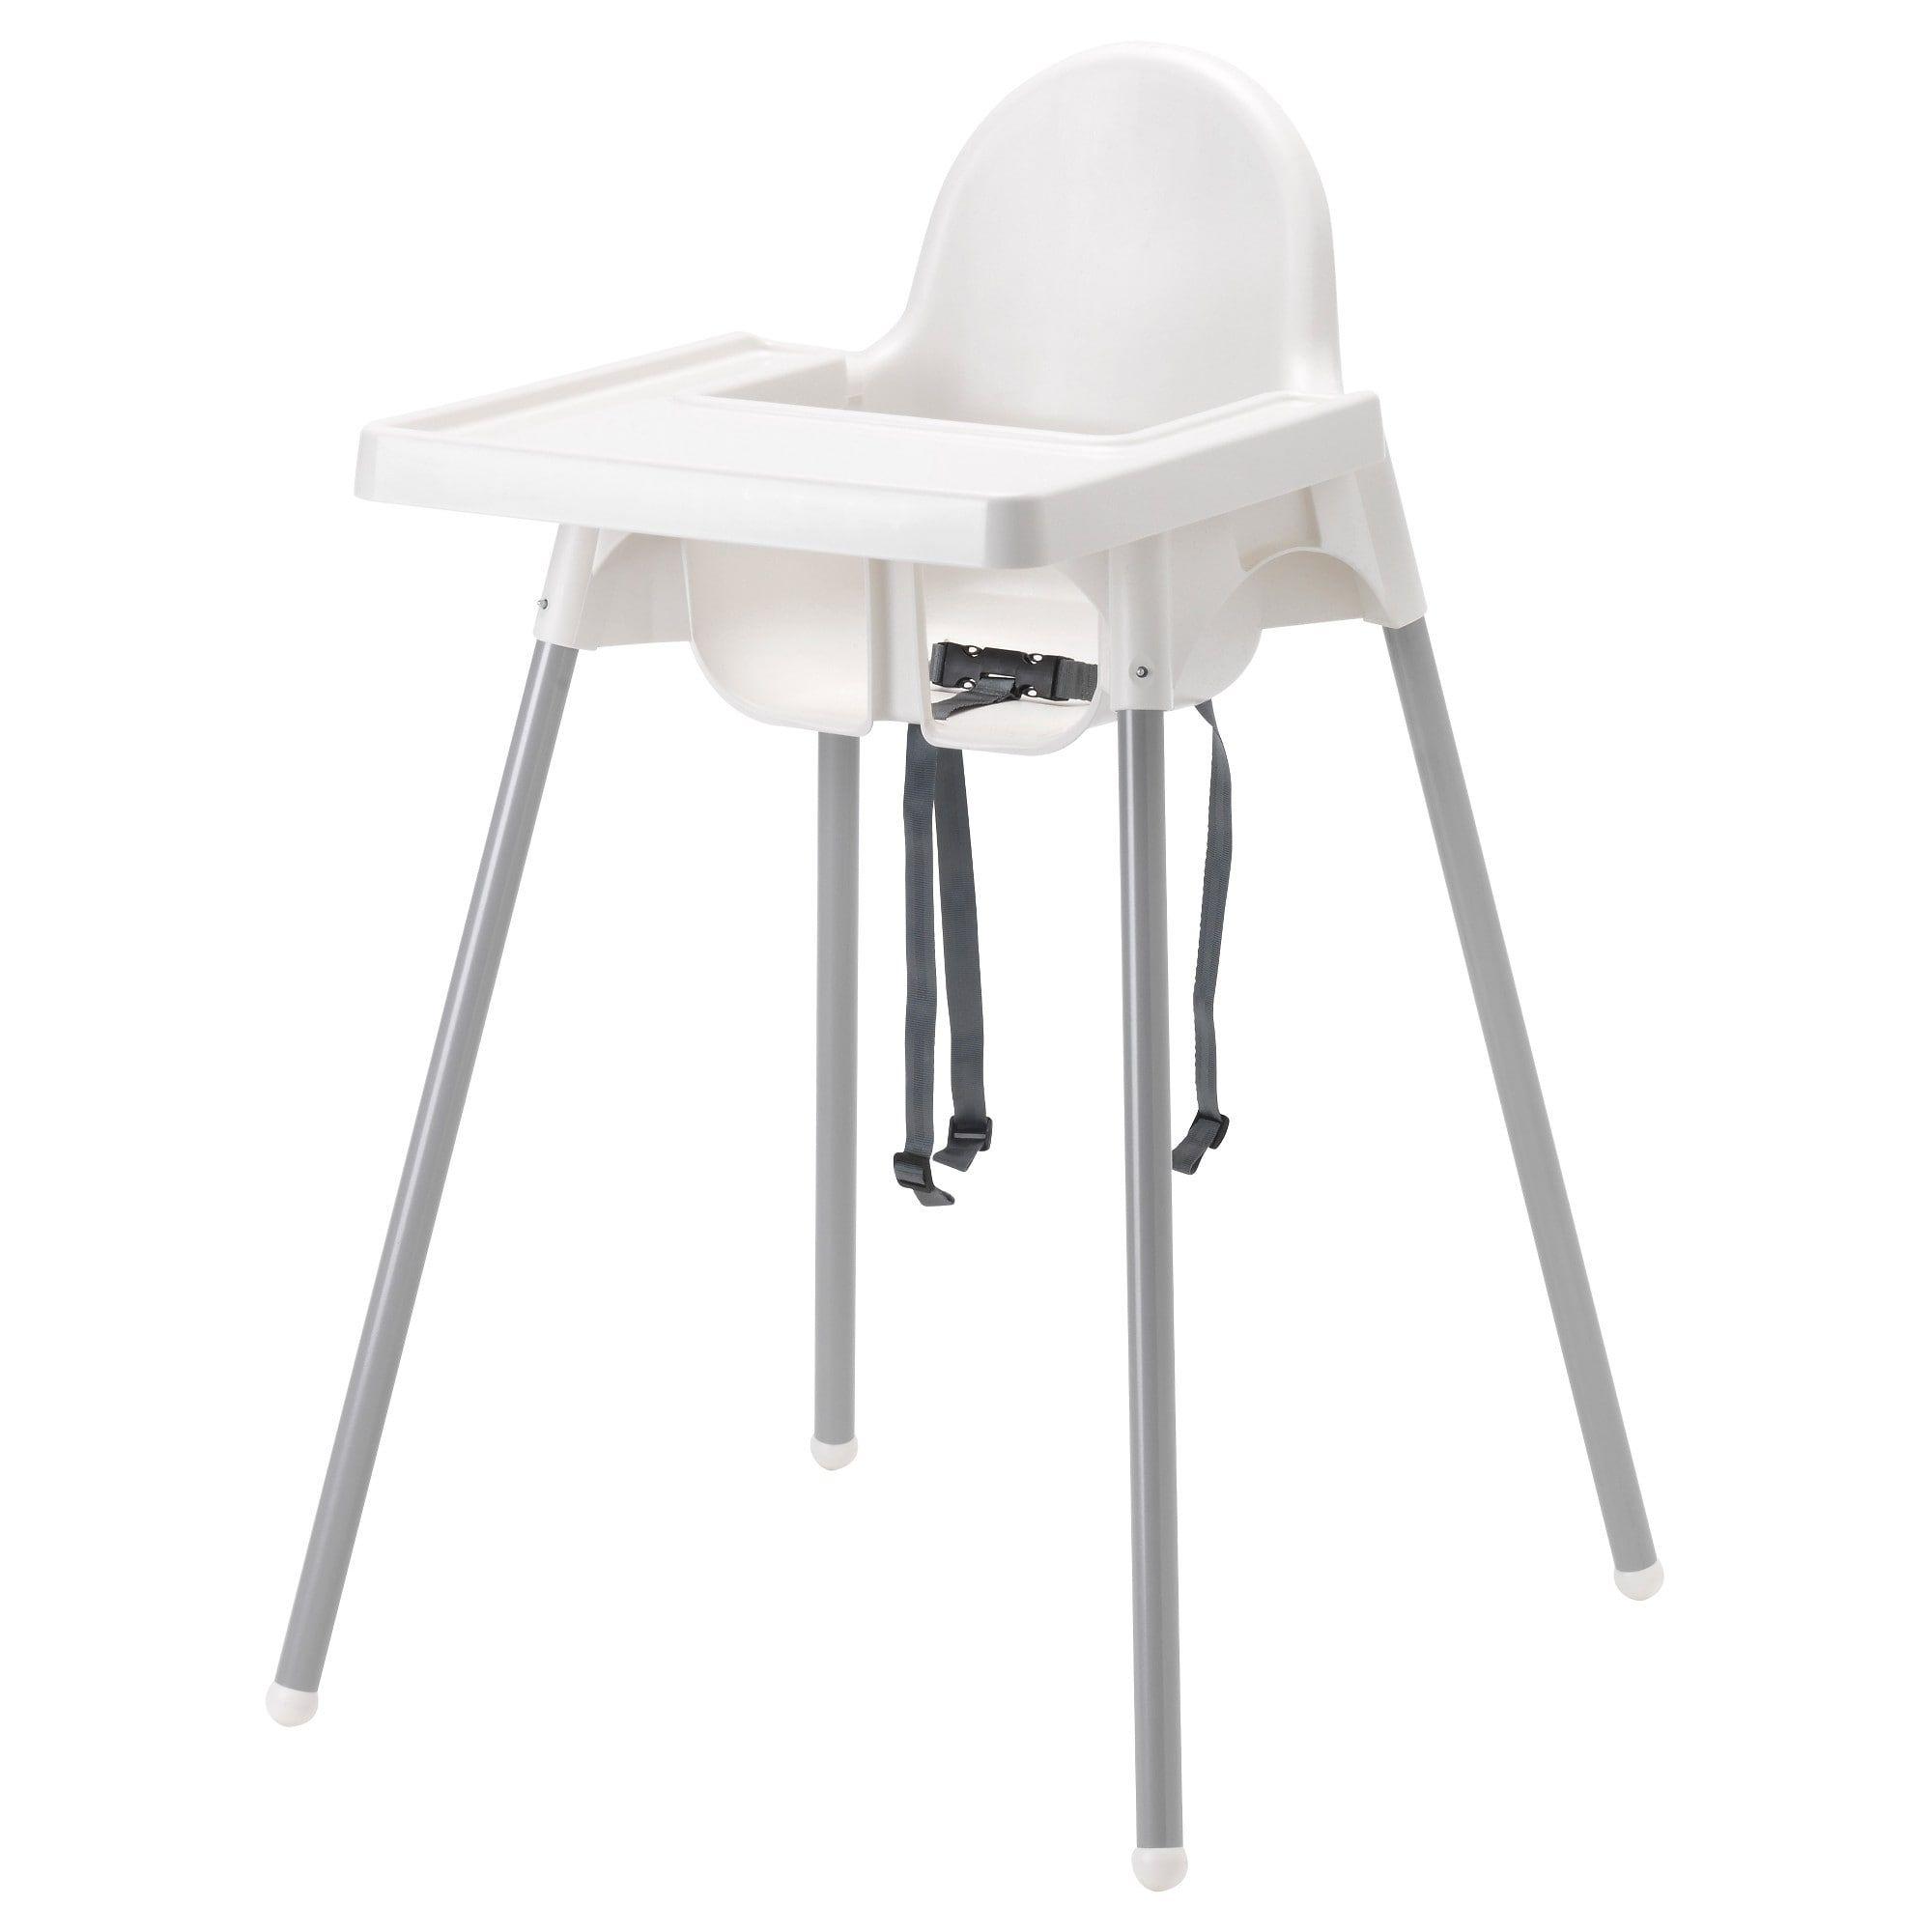 Acquista tra un'ampia scelta di materiali! Antilop High Chair With Tray White Silver Color Silver Color Ikea Ikea High Chair Antilop High Chair Best High Chairs